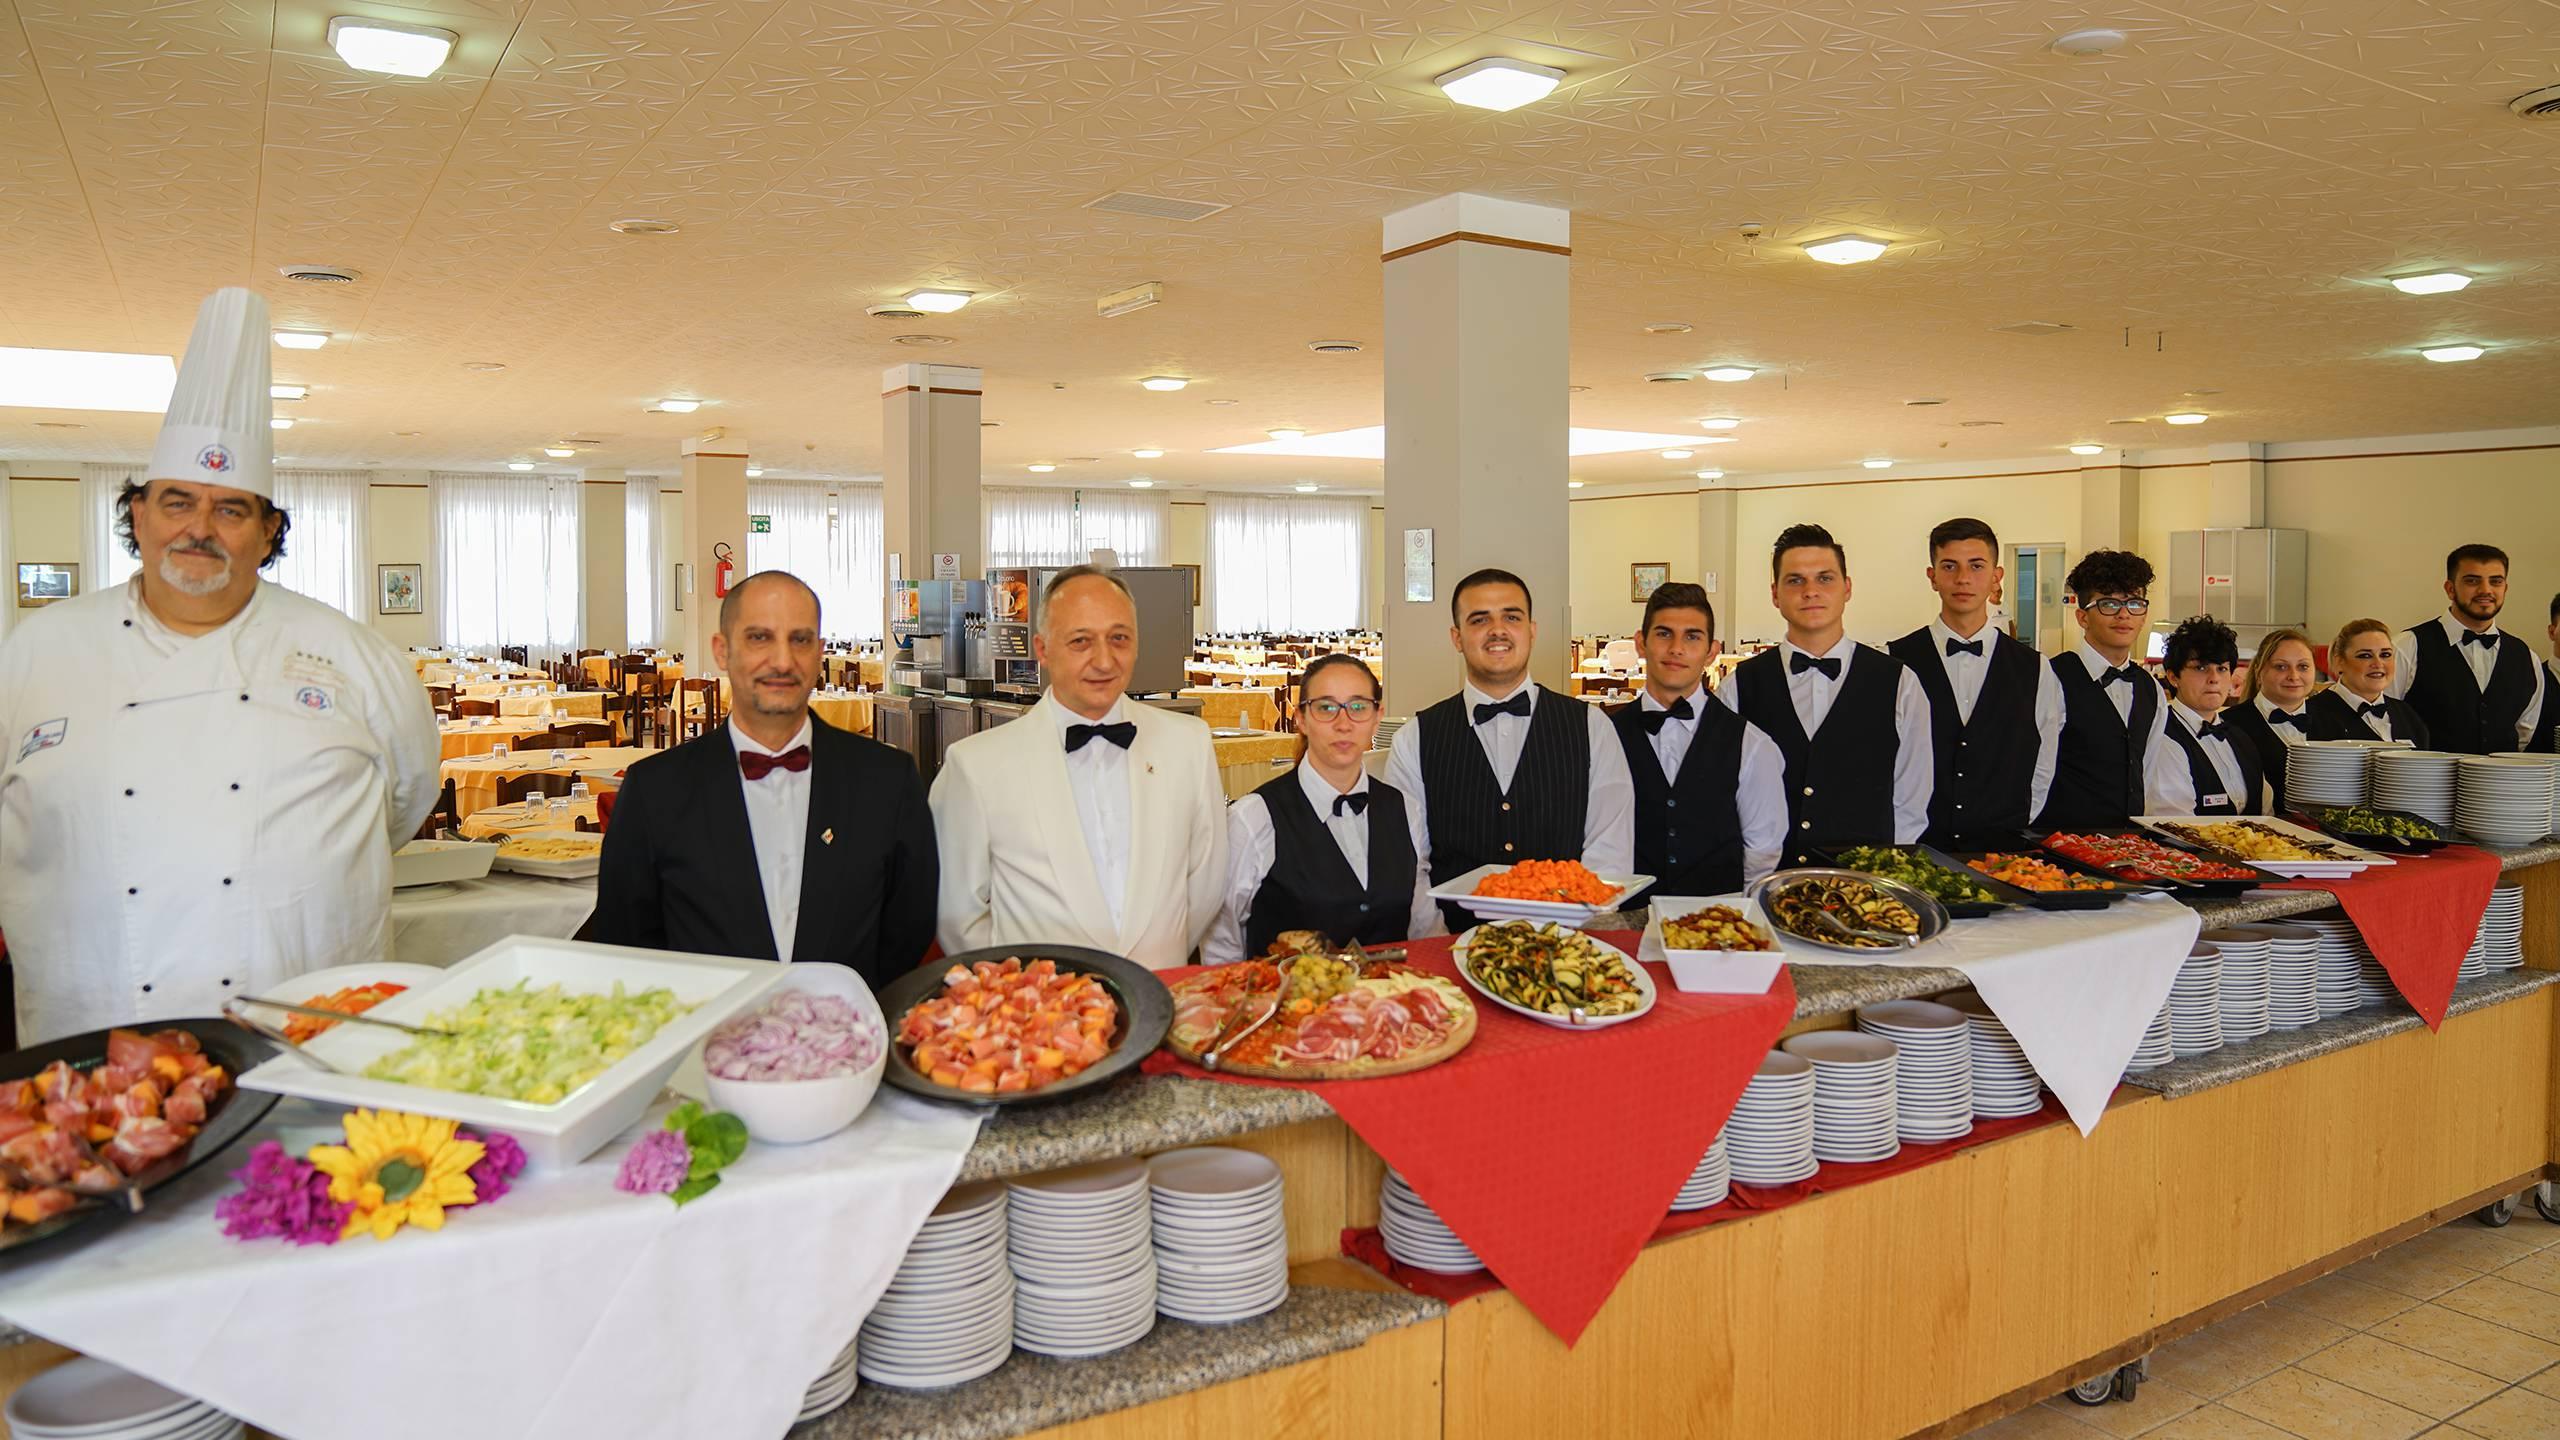 Santa-Caterina-Village-Scalea-restaurant-personnel-de-cuisine-2-DSC00258